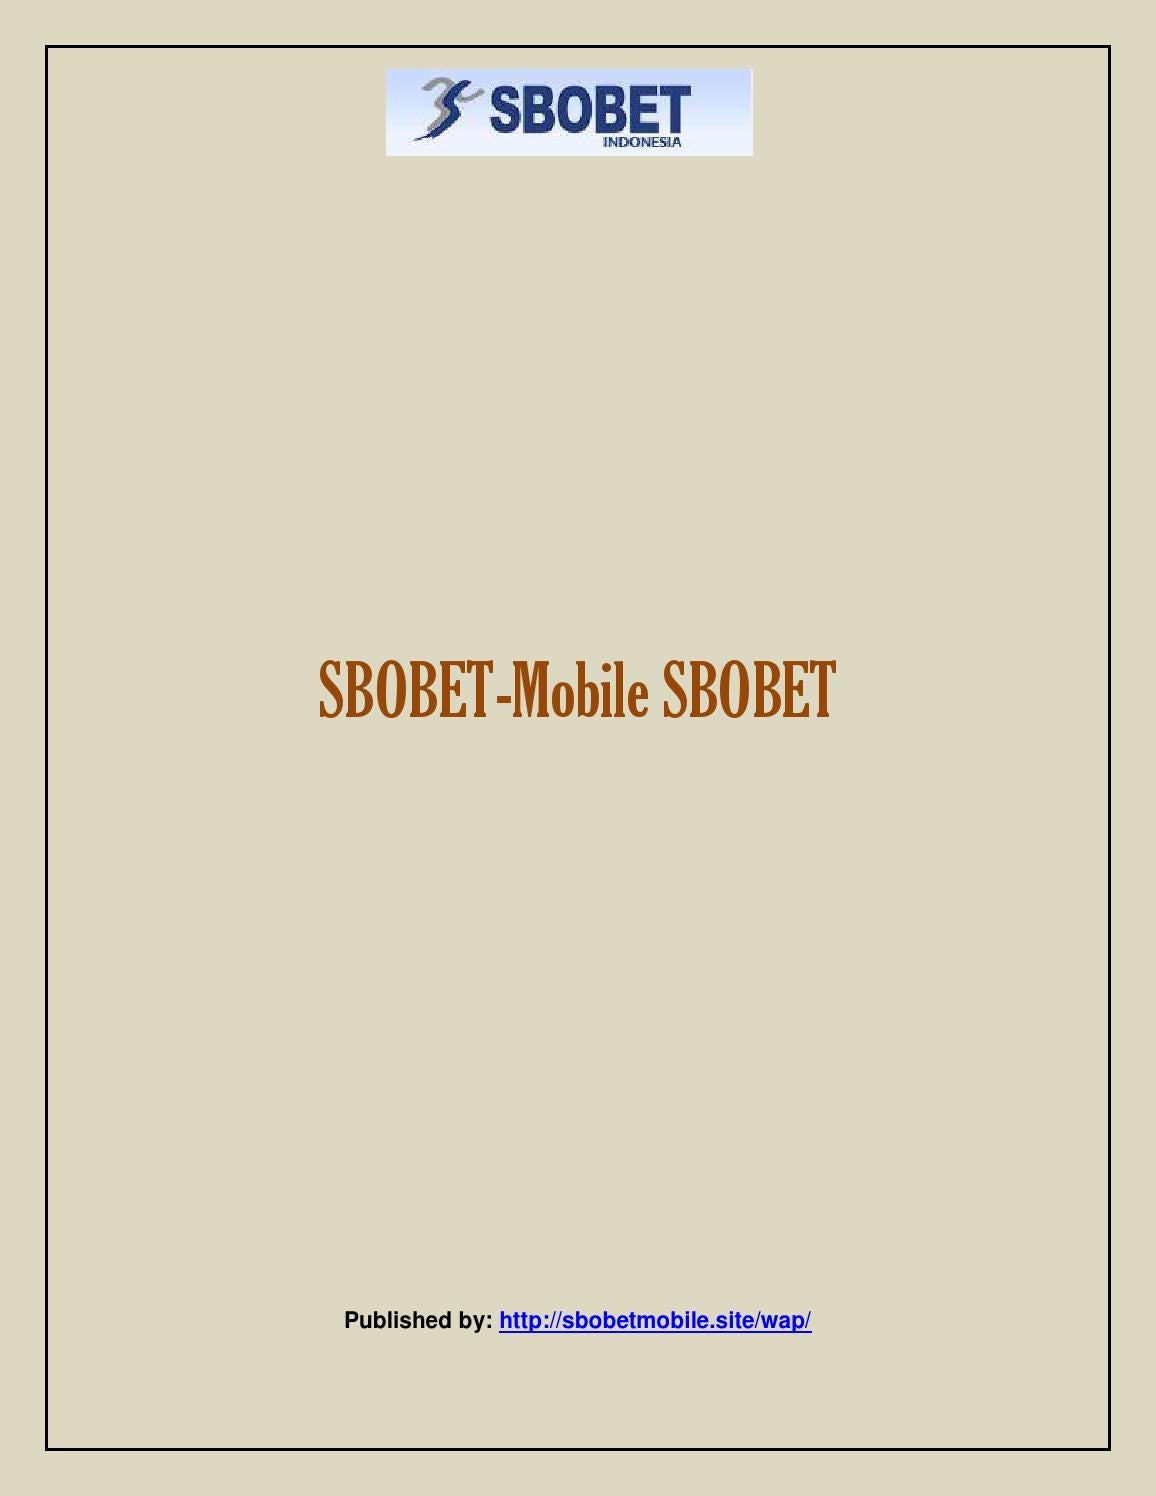 Sbobet Mobile Sbobet By Borealiscepheus Issuu